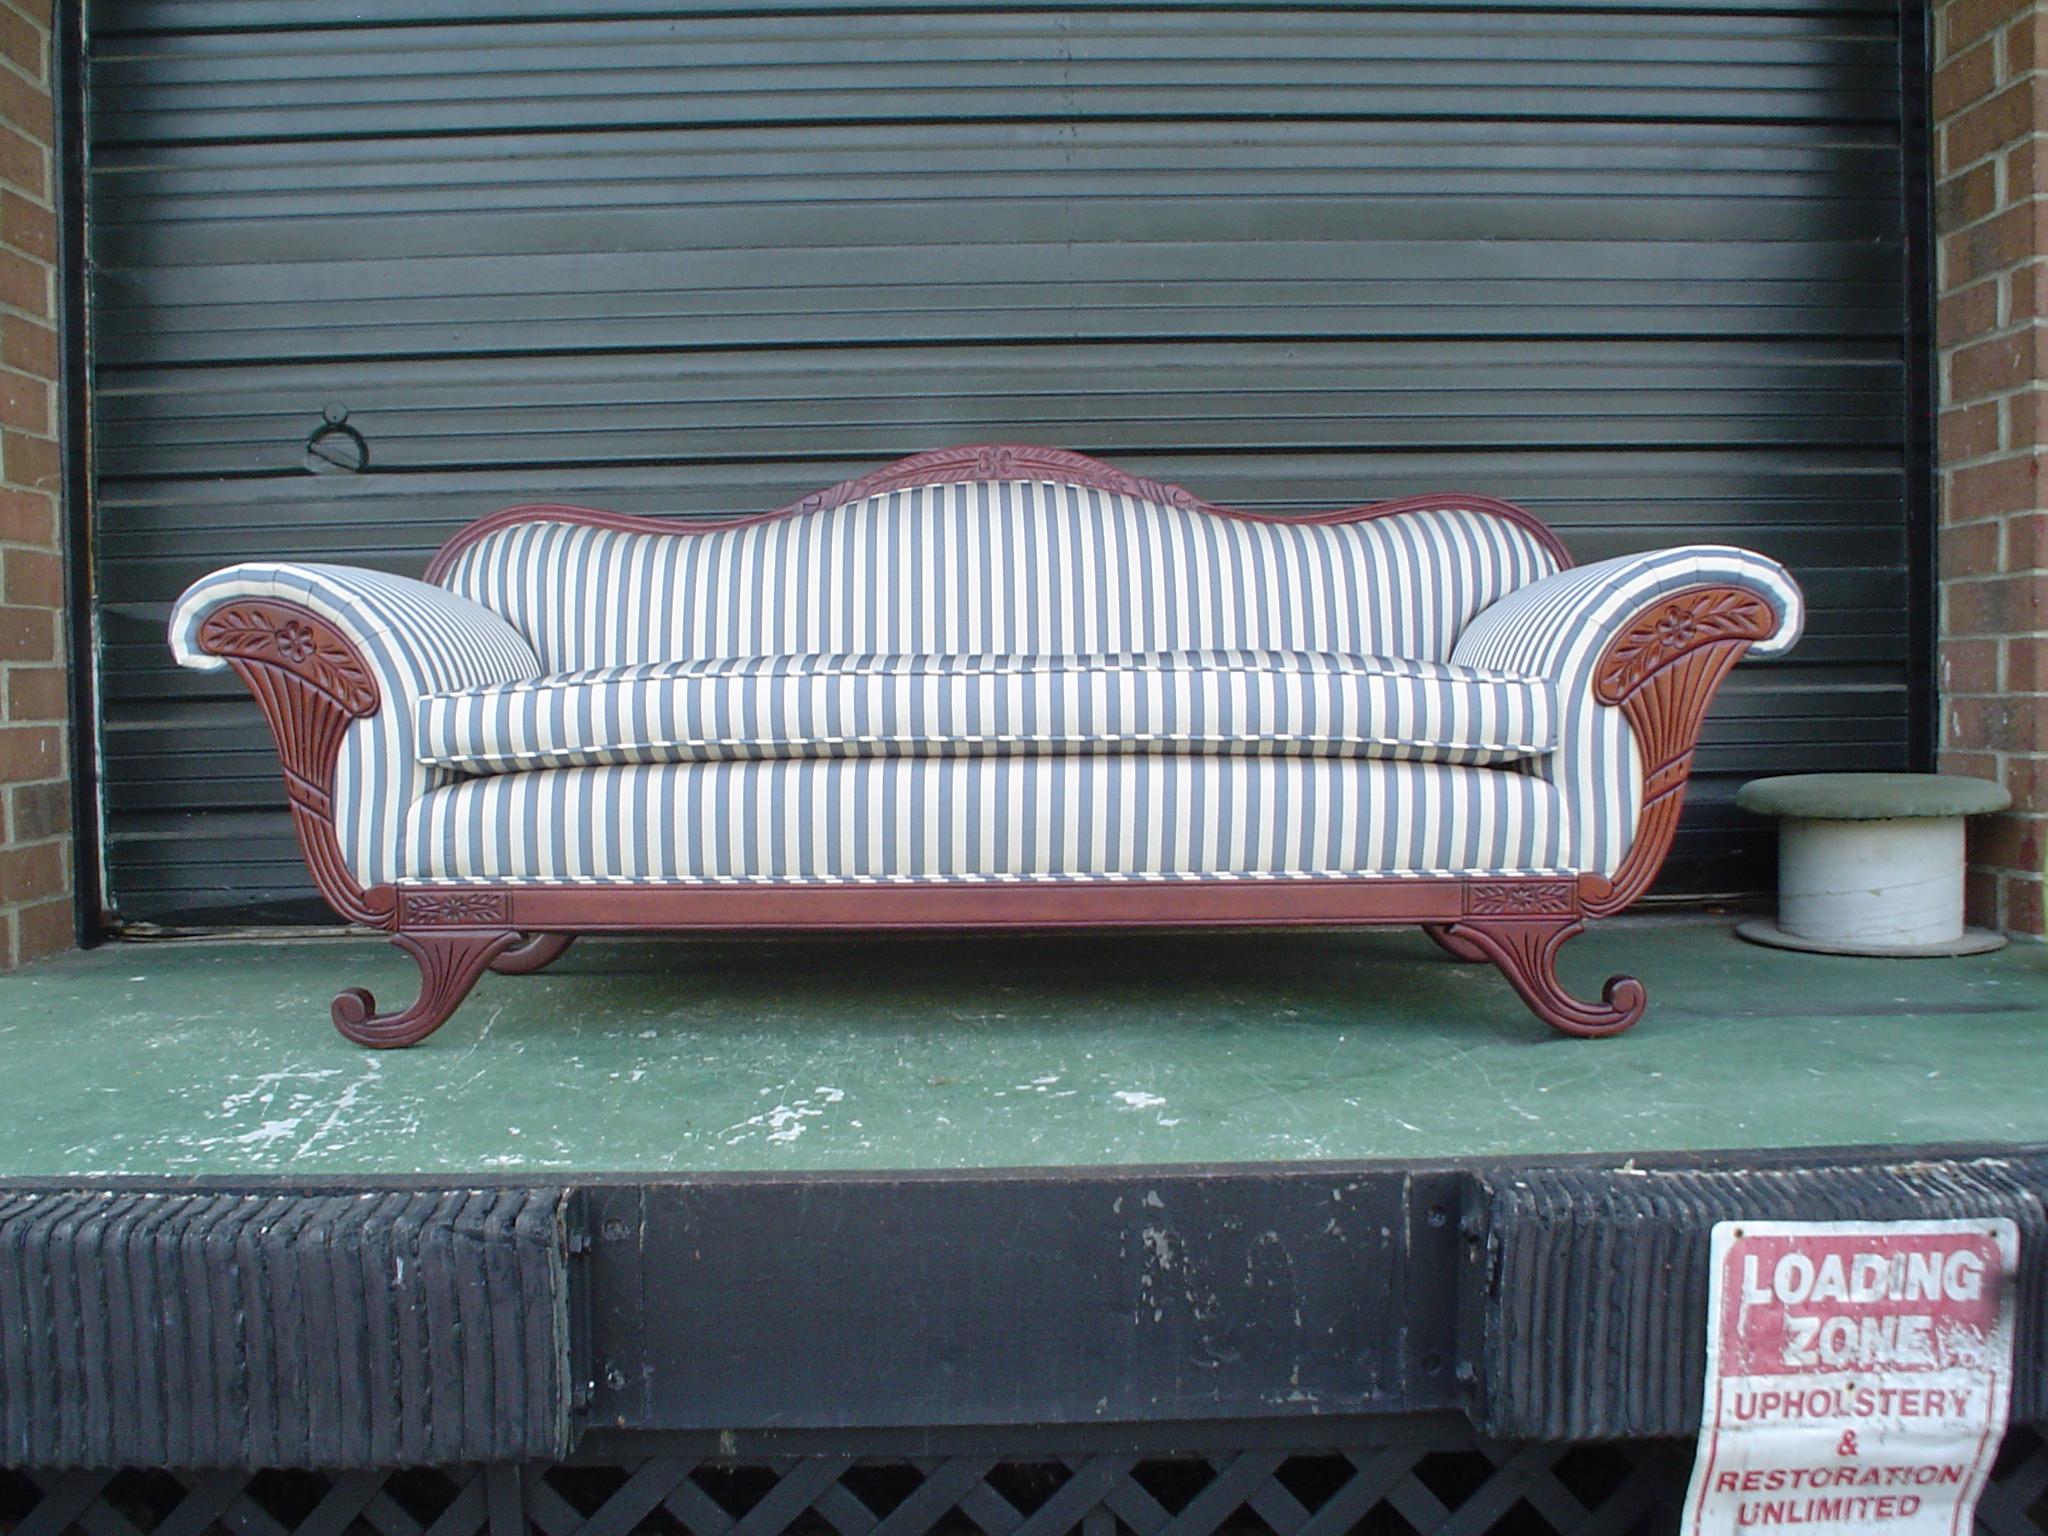 Upholstery Restoration & Select Fabrics - ad image